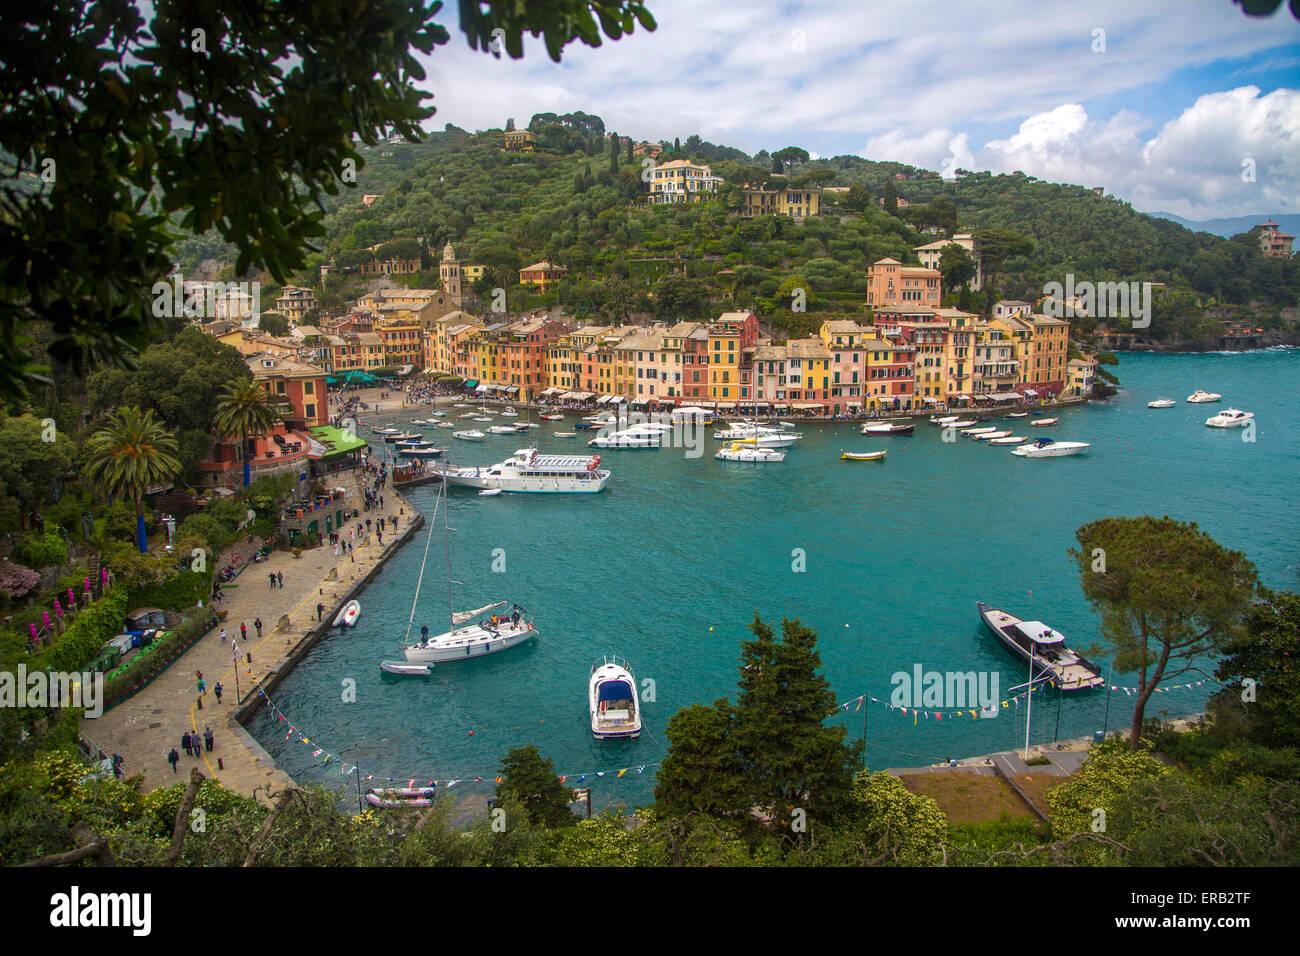 View at port in Portofino, Italy. - Stock Image